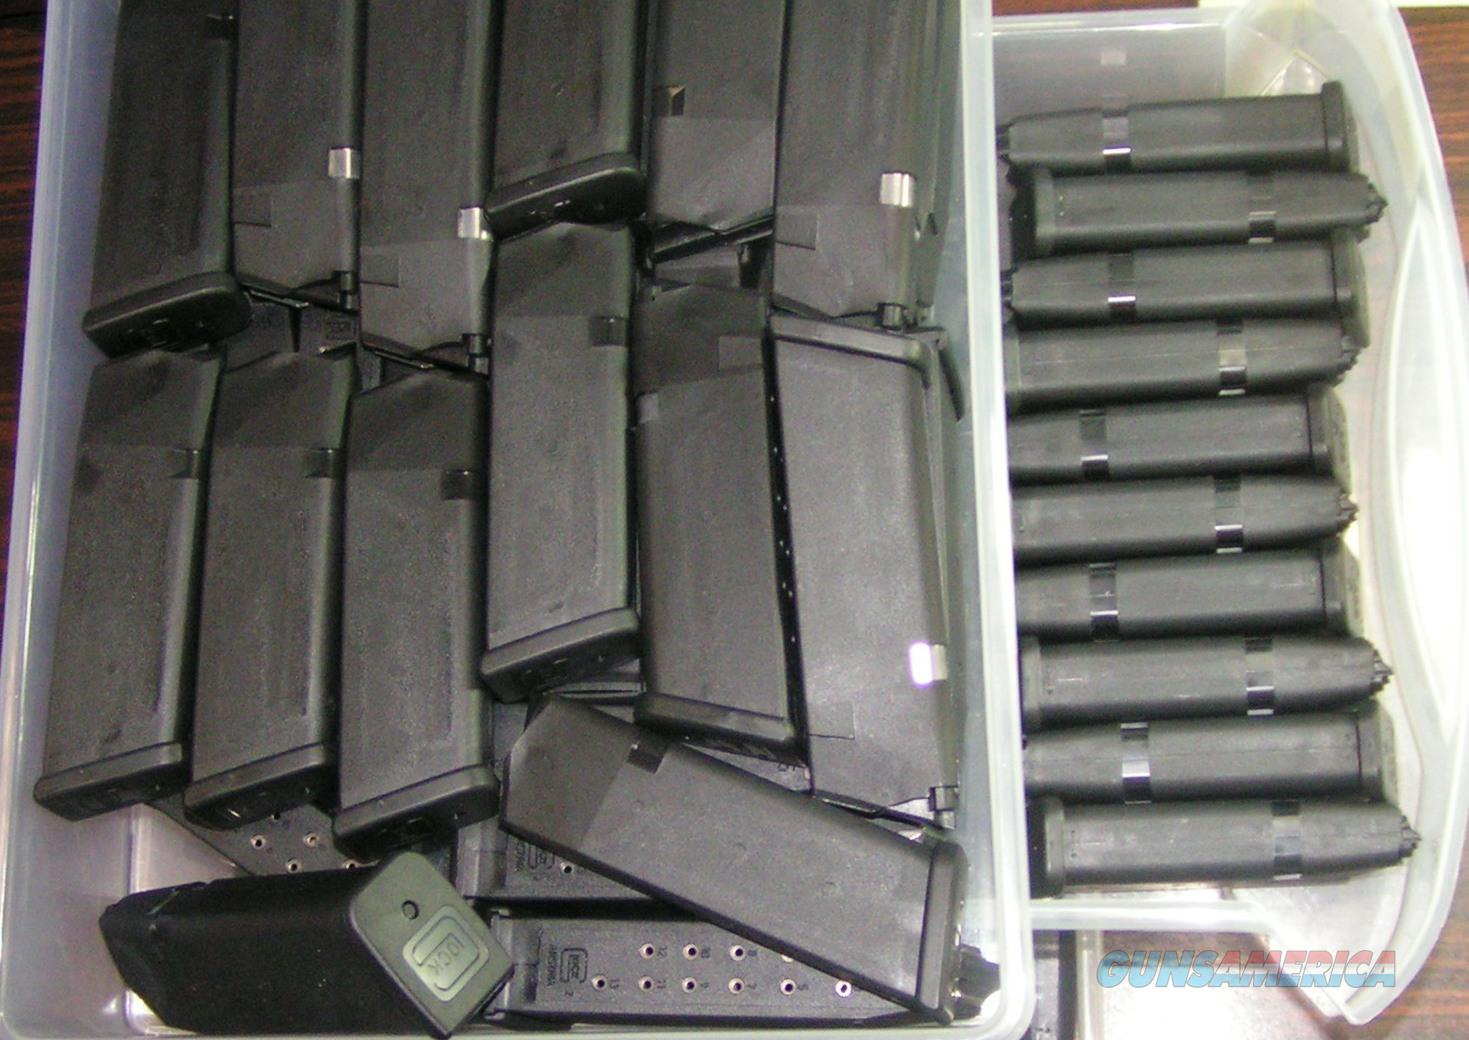 3 Glock mags 17 19 21 22 23 26 27 42 your choice  Non-Guns > Magazines & Clips > Pistol Magazines > Glock